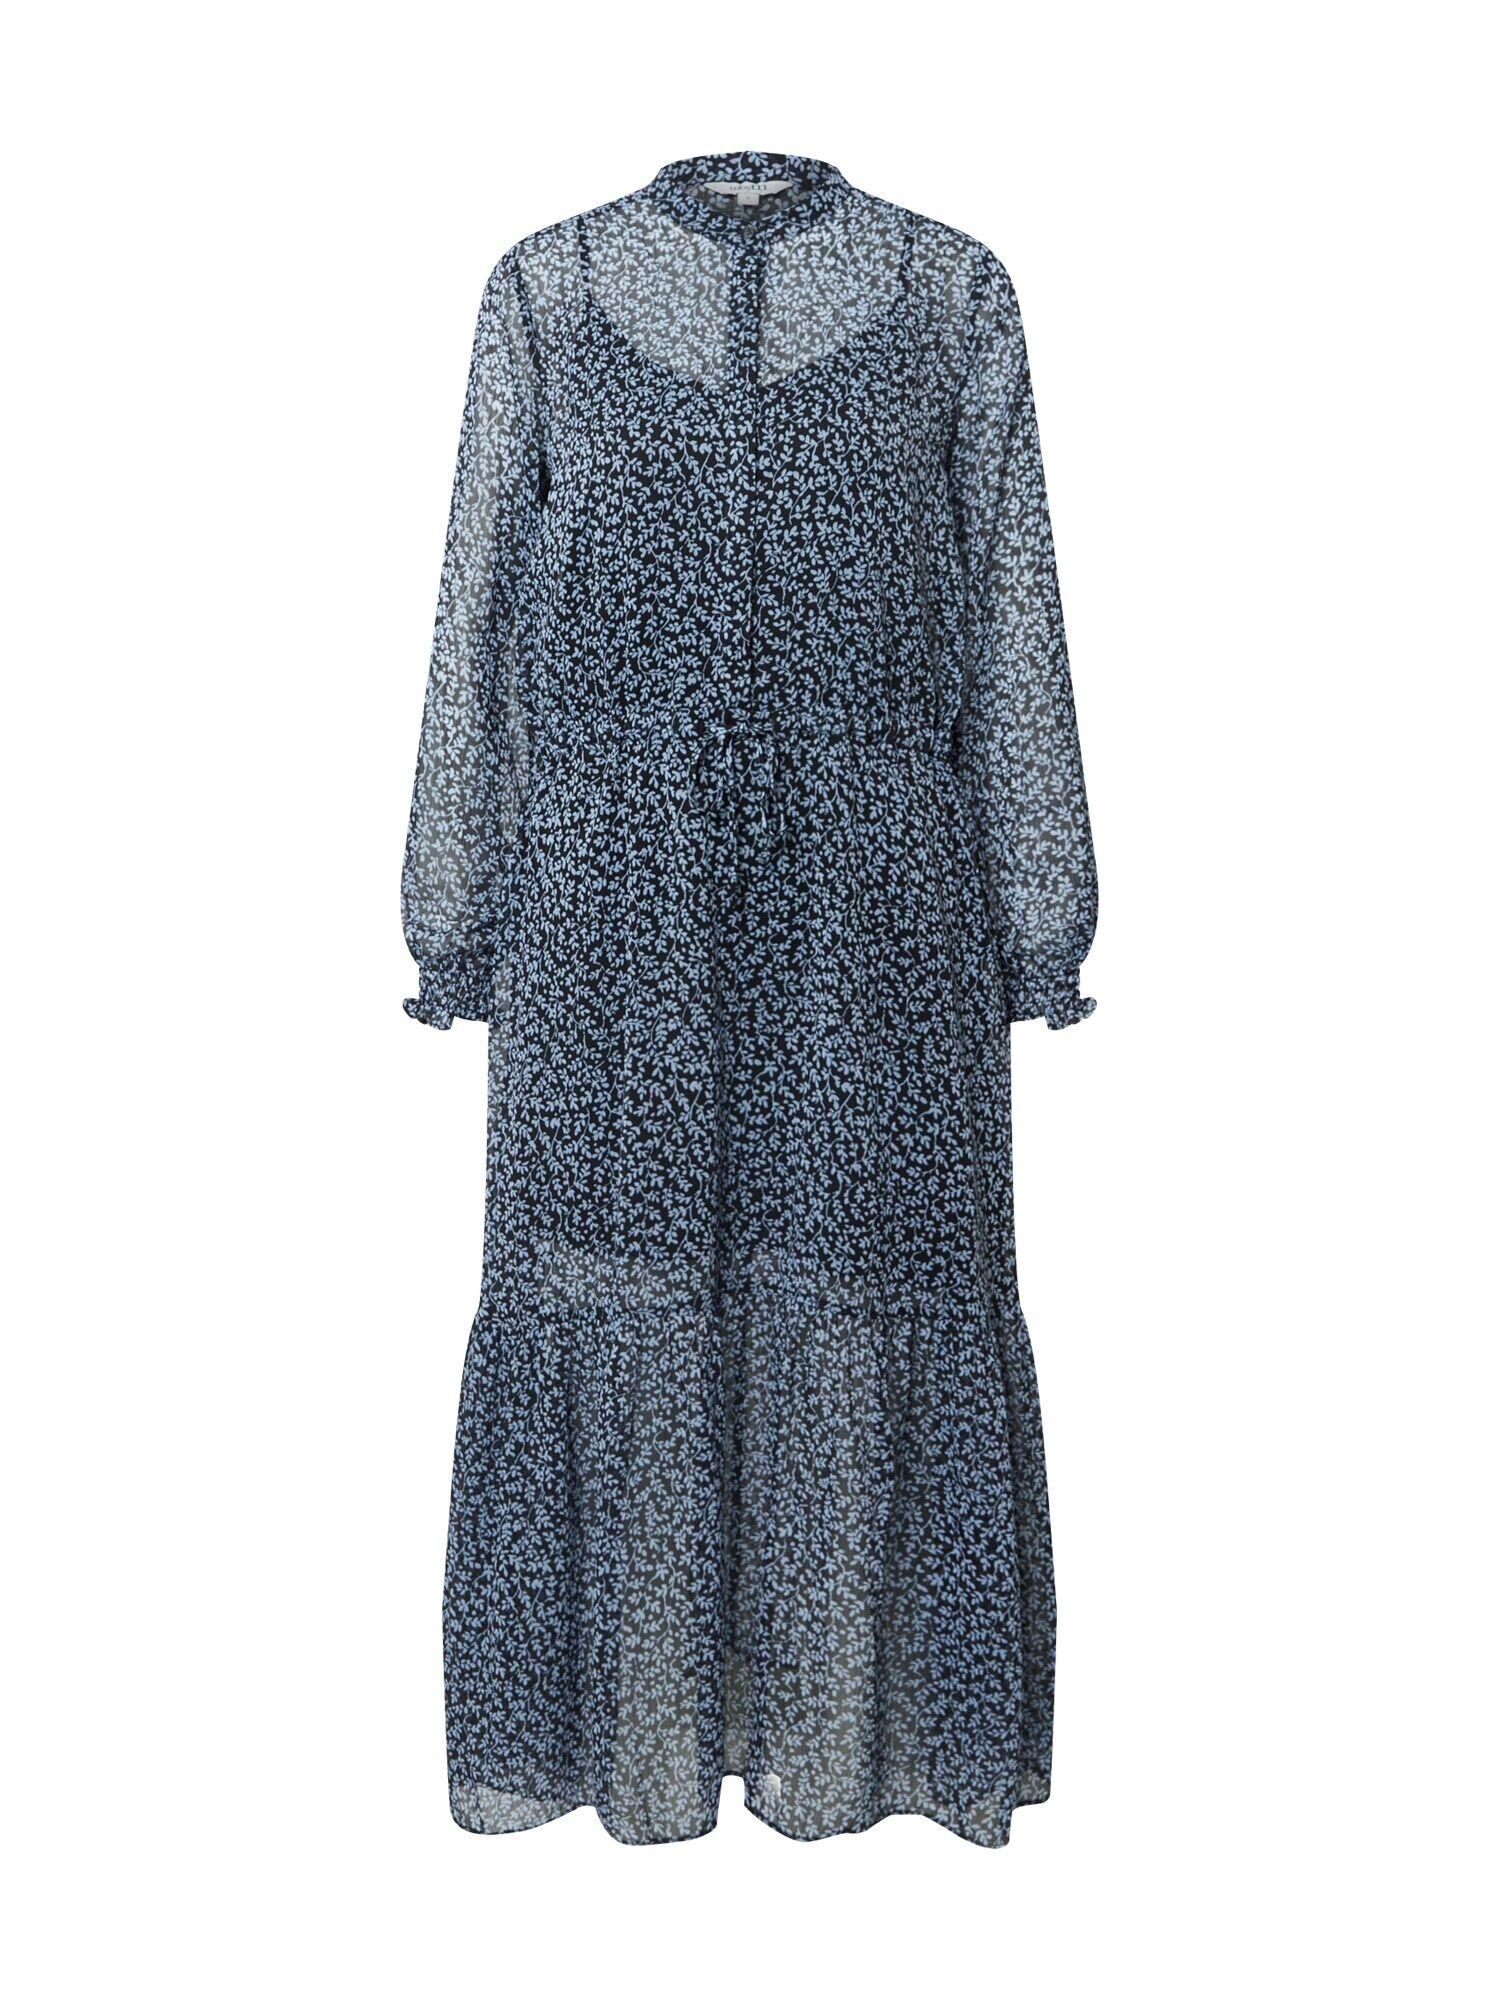 mbym Robe 'Diaz'  - Bleu - Taille: 34 - female